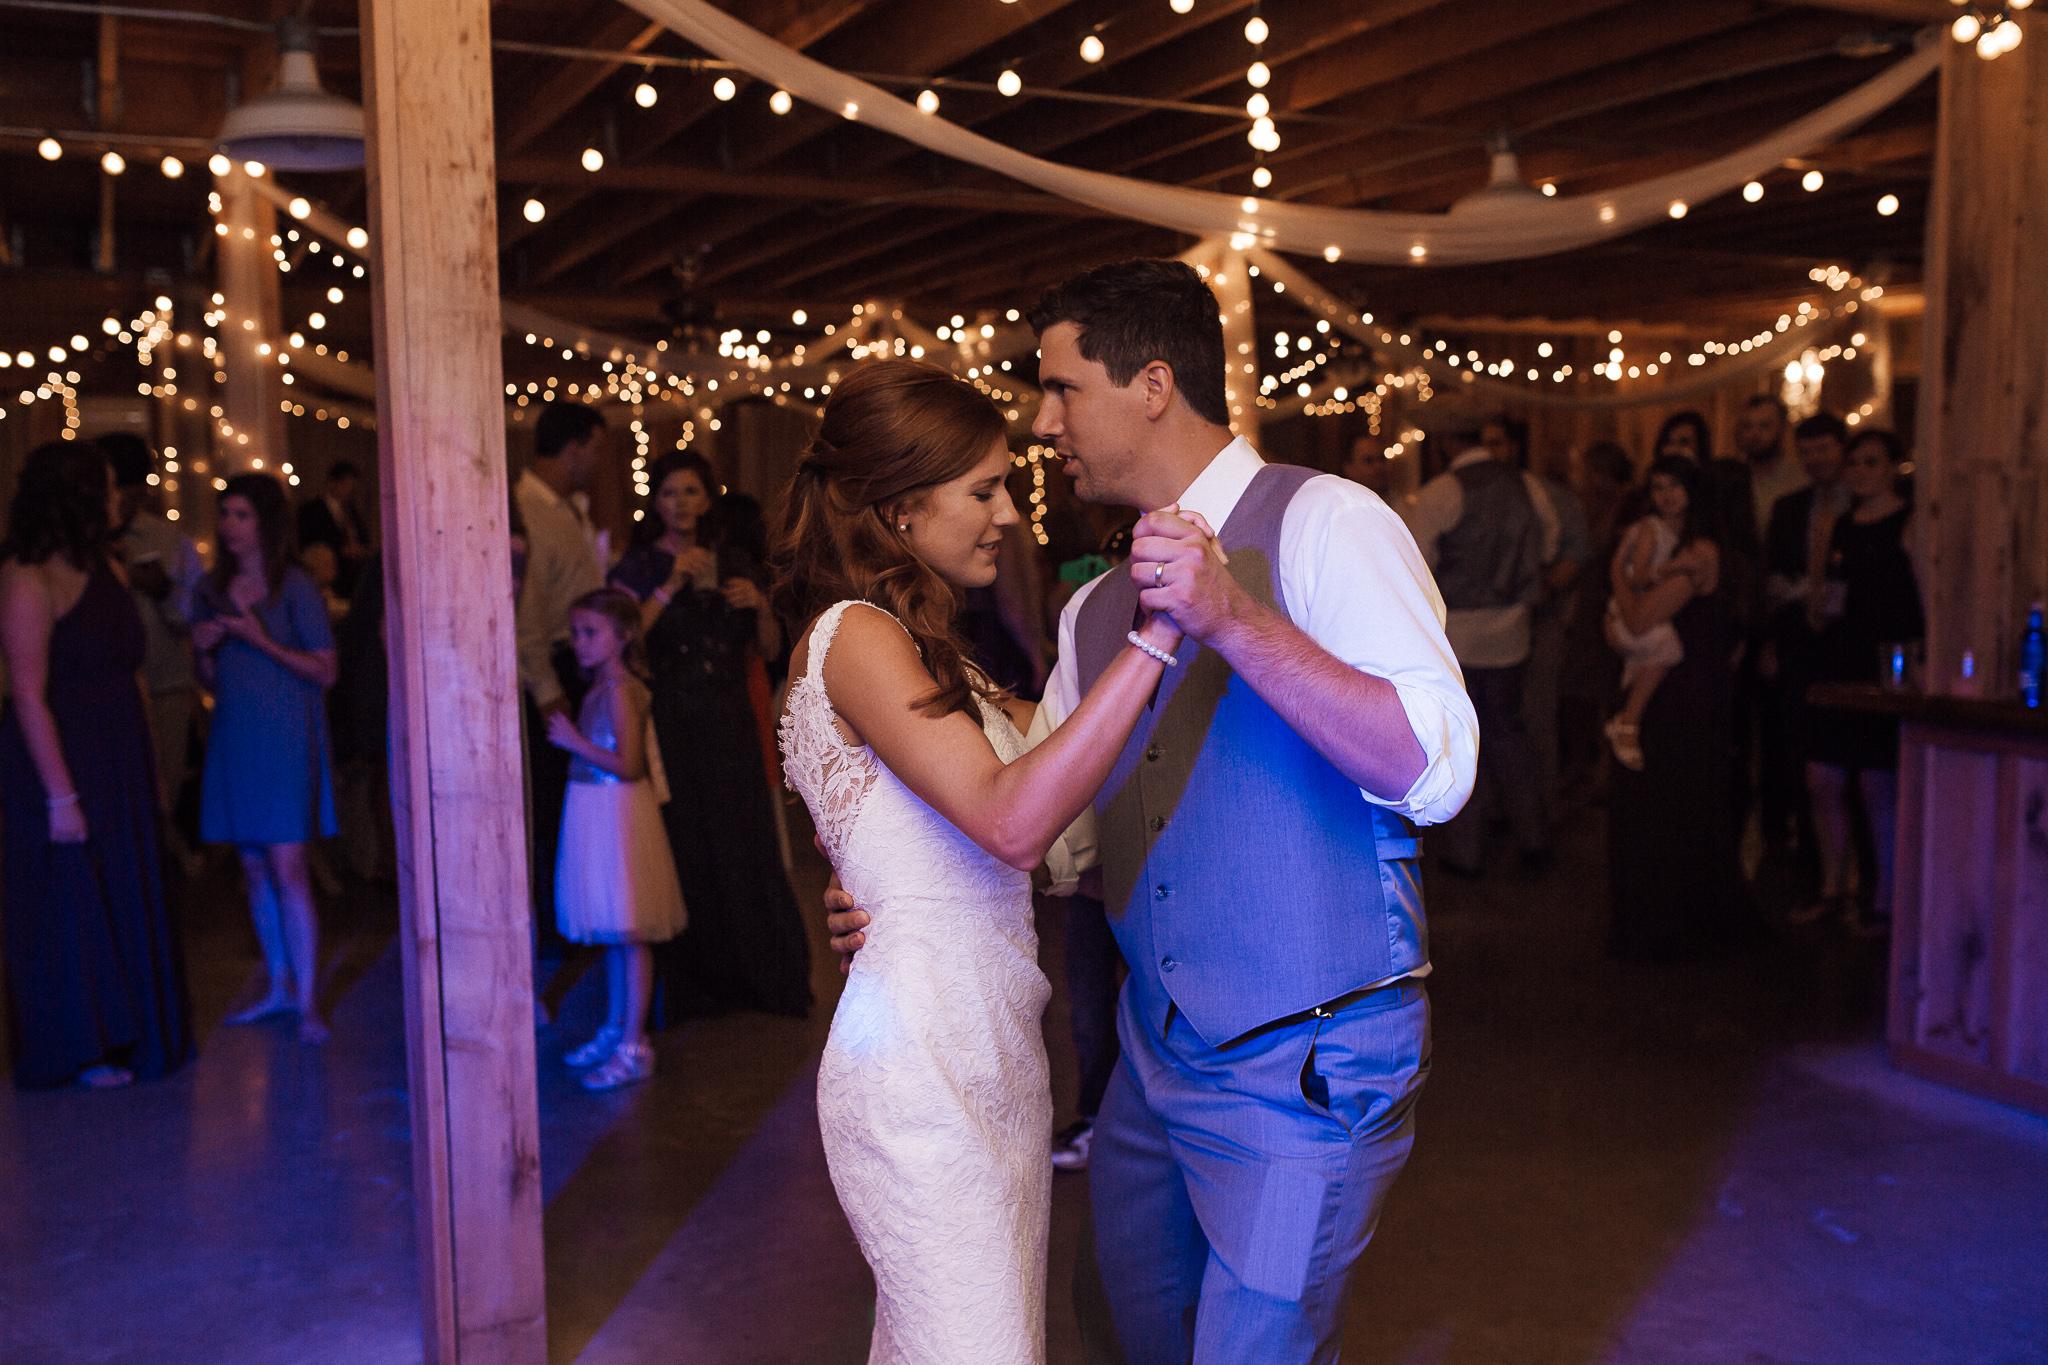 memphis-wedding-photographer-southern-wedding-venue-cedar-hill-farms-wedding